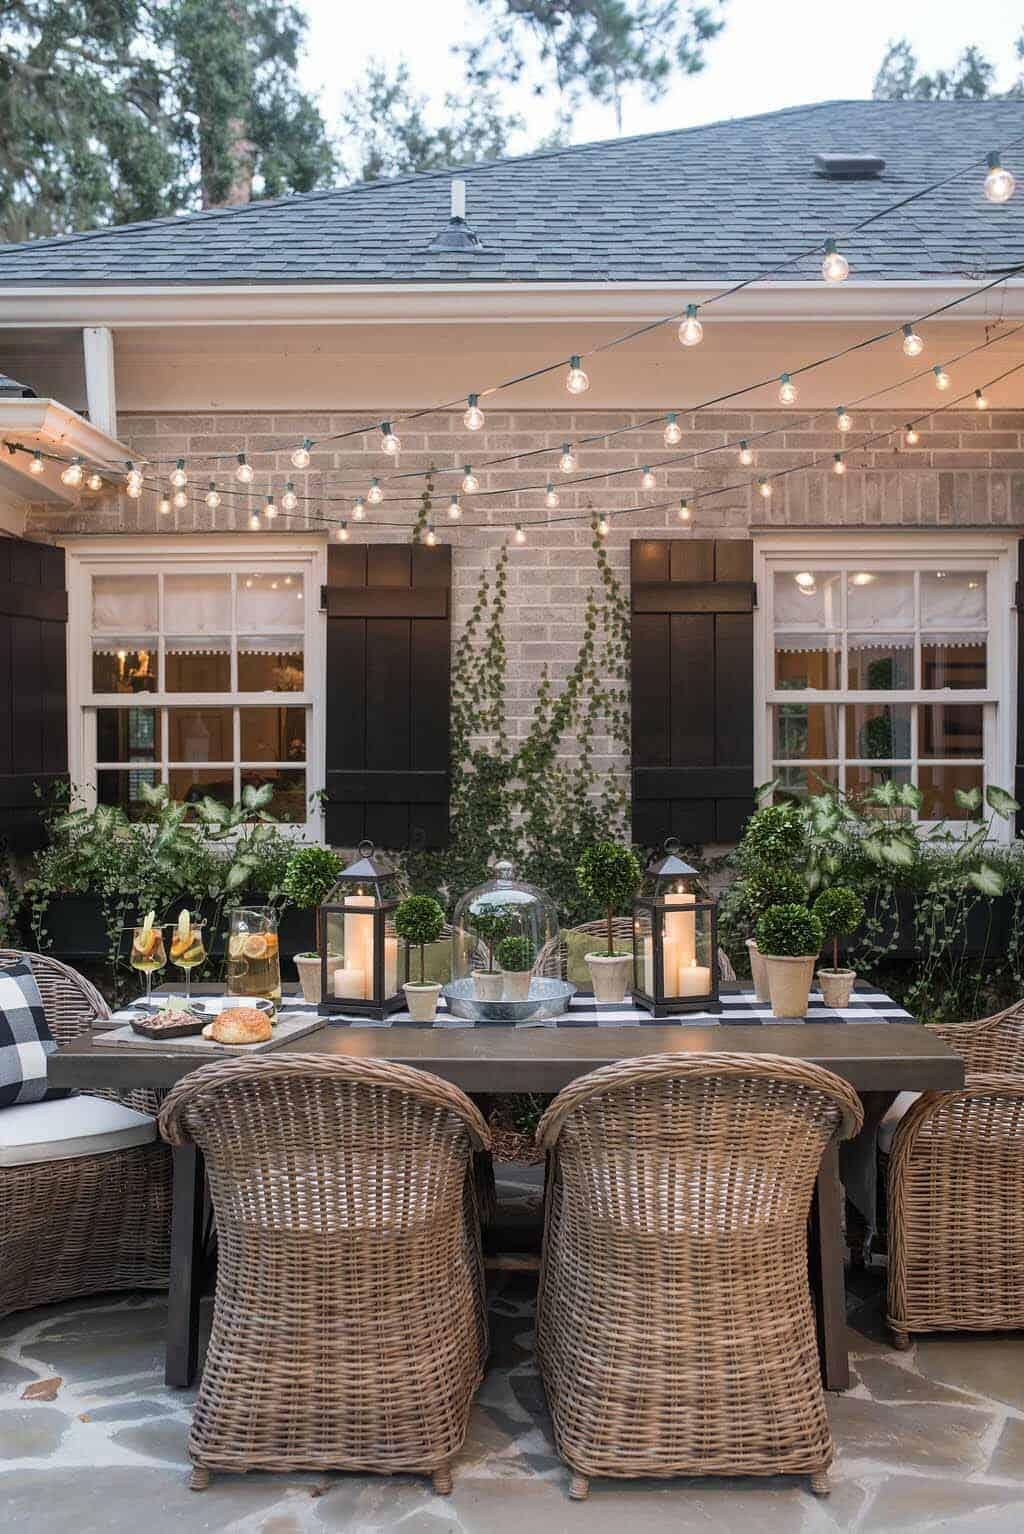 28 delightful backyard design ideas for